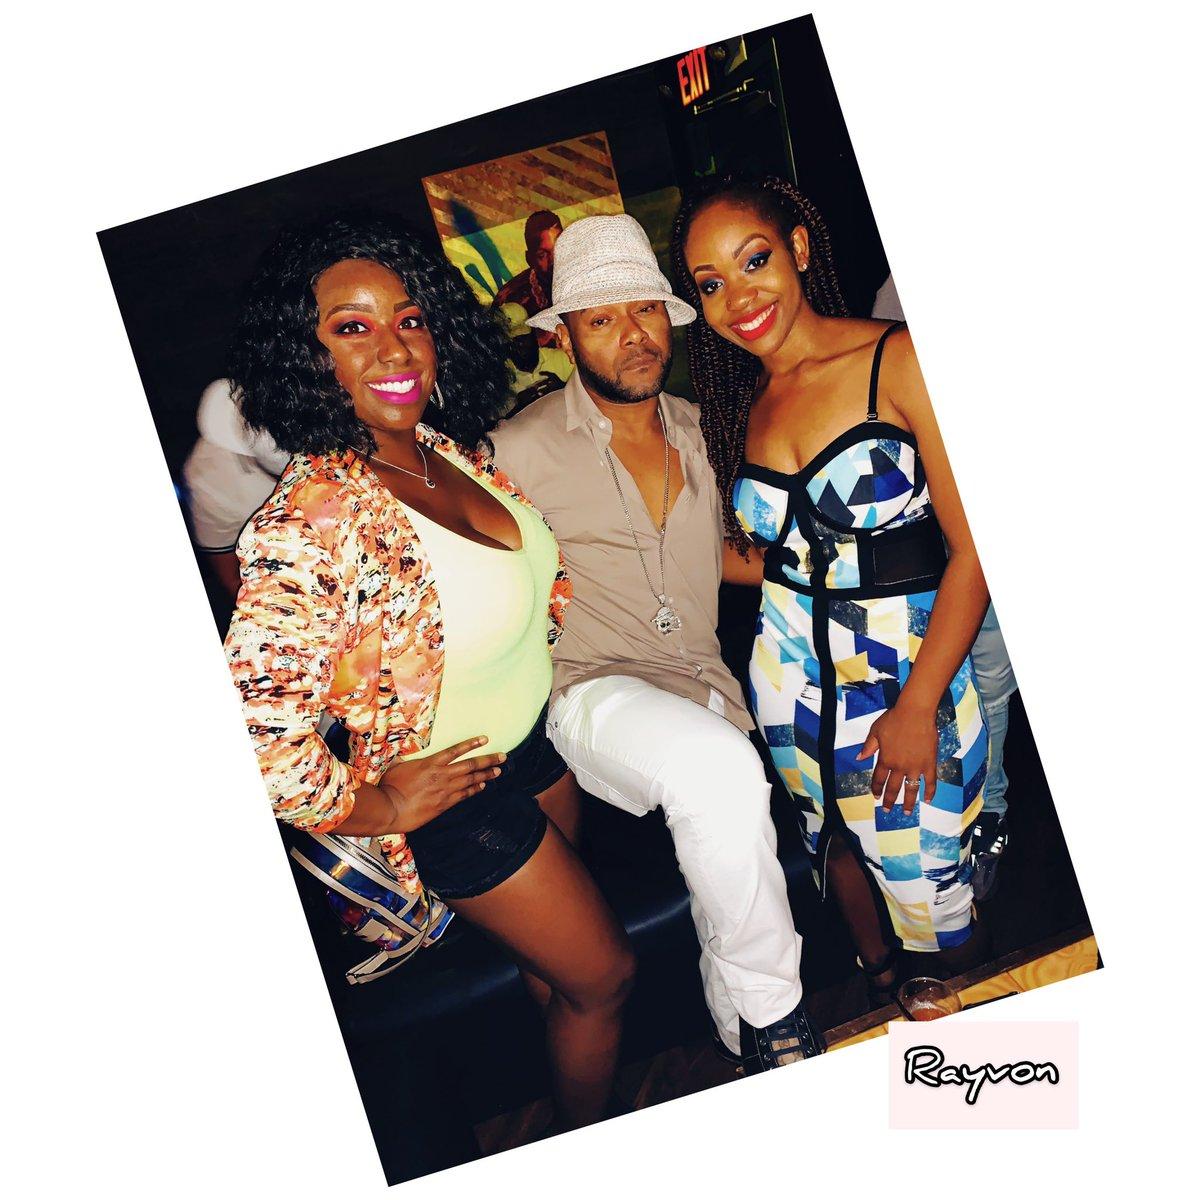 Rayvon #earthstrong #bash w @djepps #sugarbear #artist #bashment #ladidadi #nogunsnomurder #classic #rollitrollit #video #settinz #racket #club #reggae #dancehall #music #dope #miami #beach #live #show #mad #innareallife #gtcent #getthatcheddarentertainment